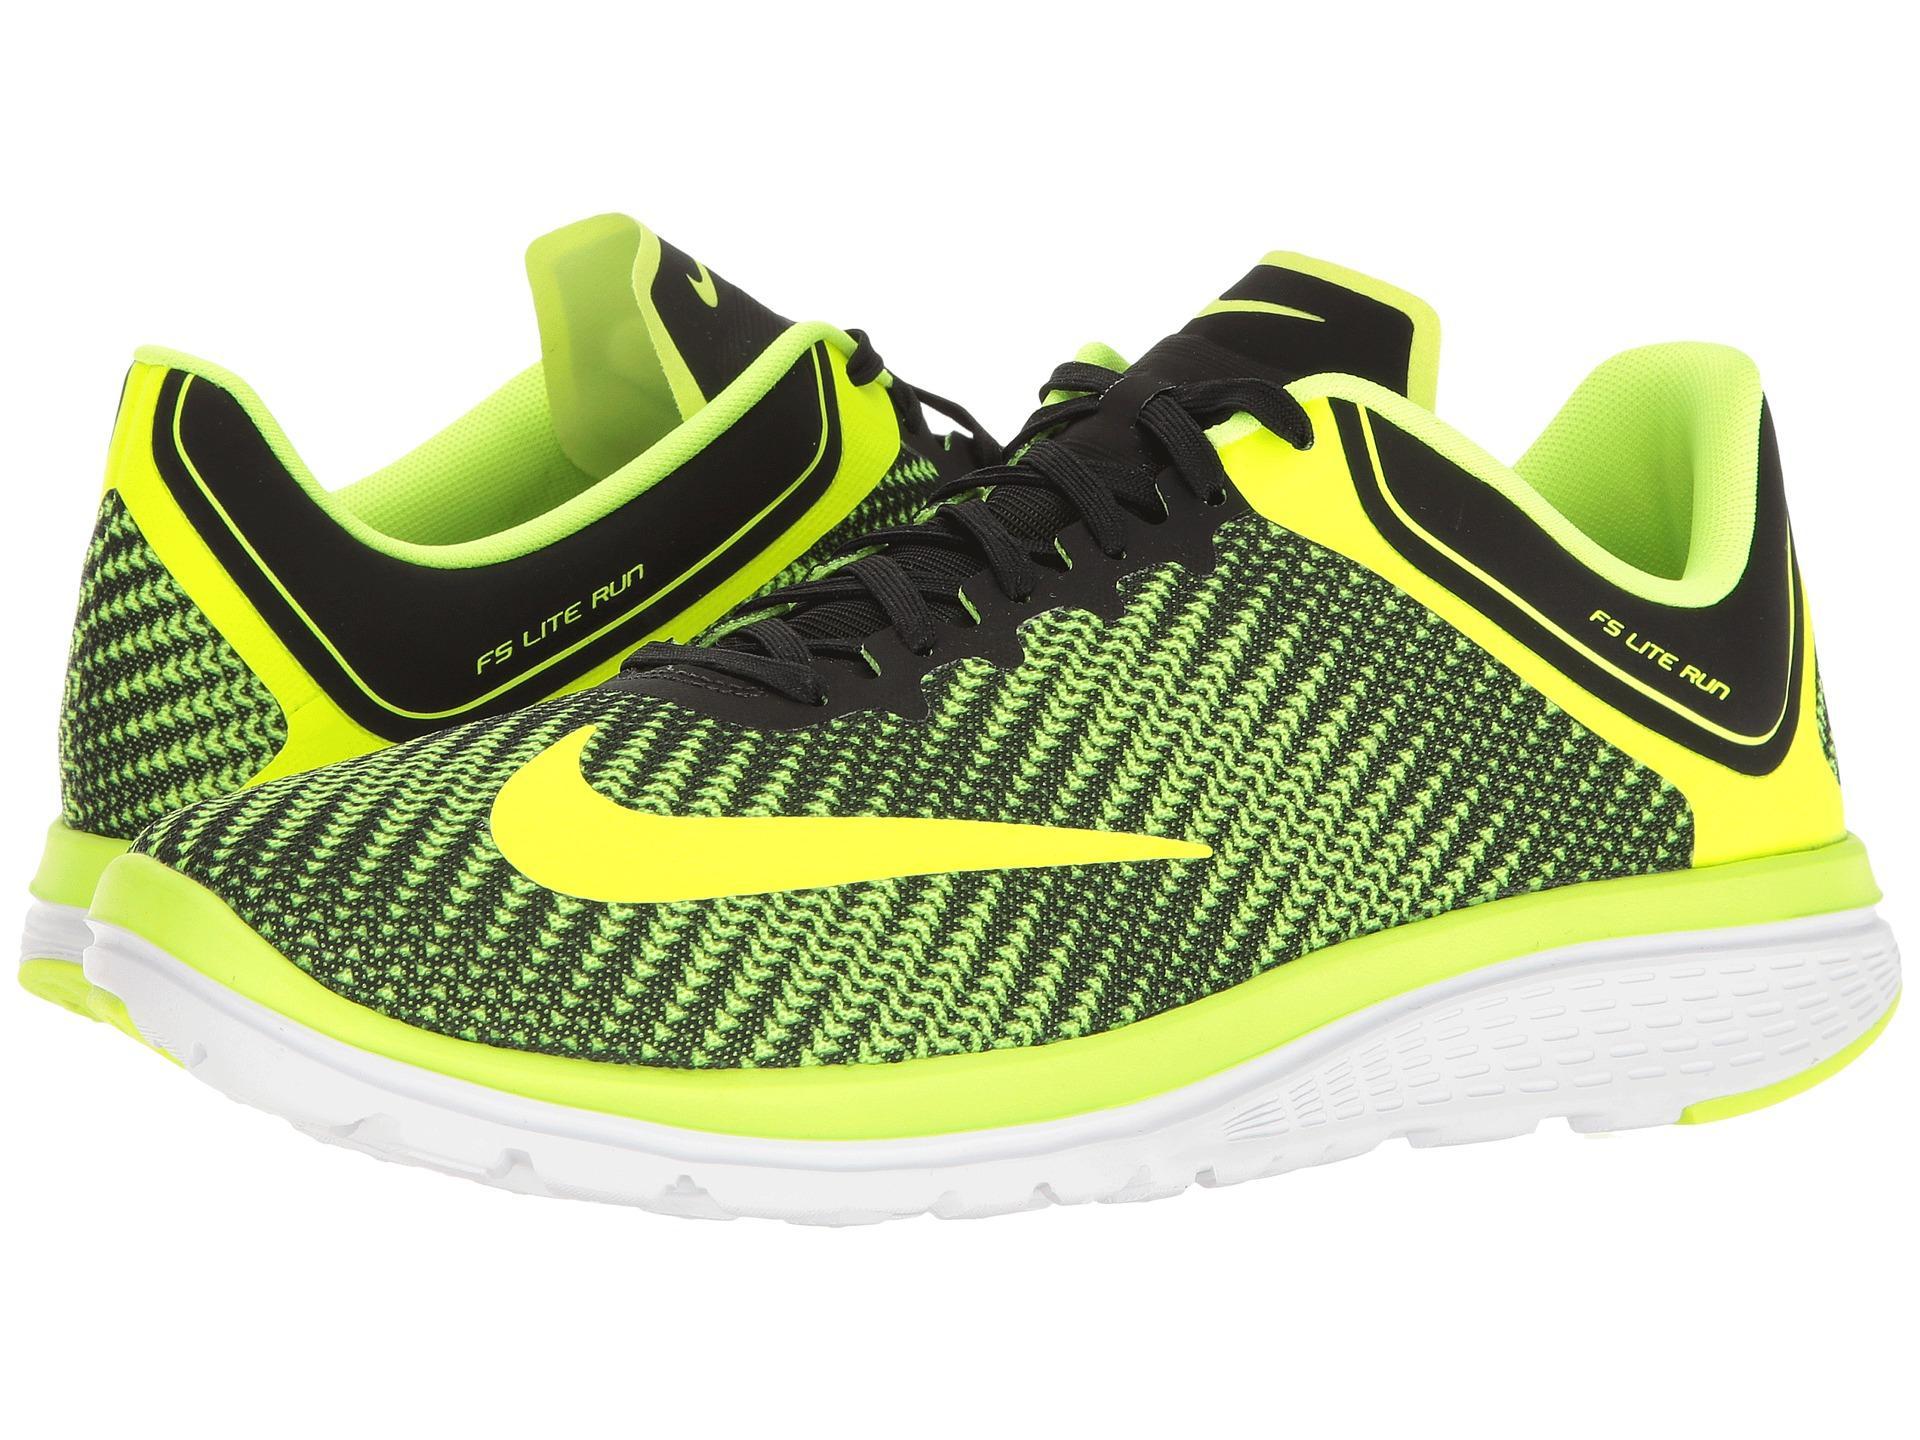 wholesale dealer eca9f 2684f Nike Yellow Fs Lite Run 4 Premium for men